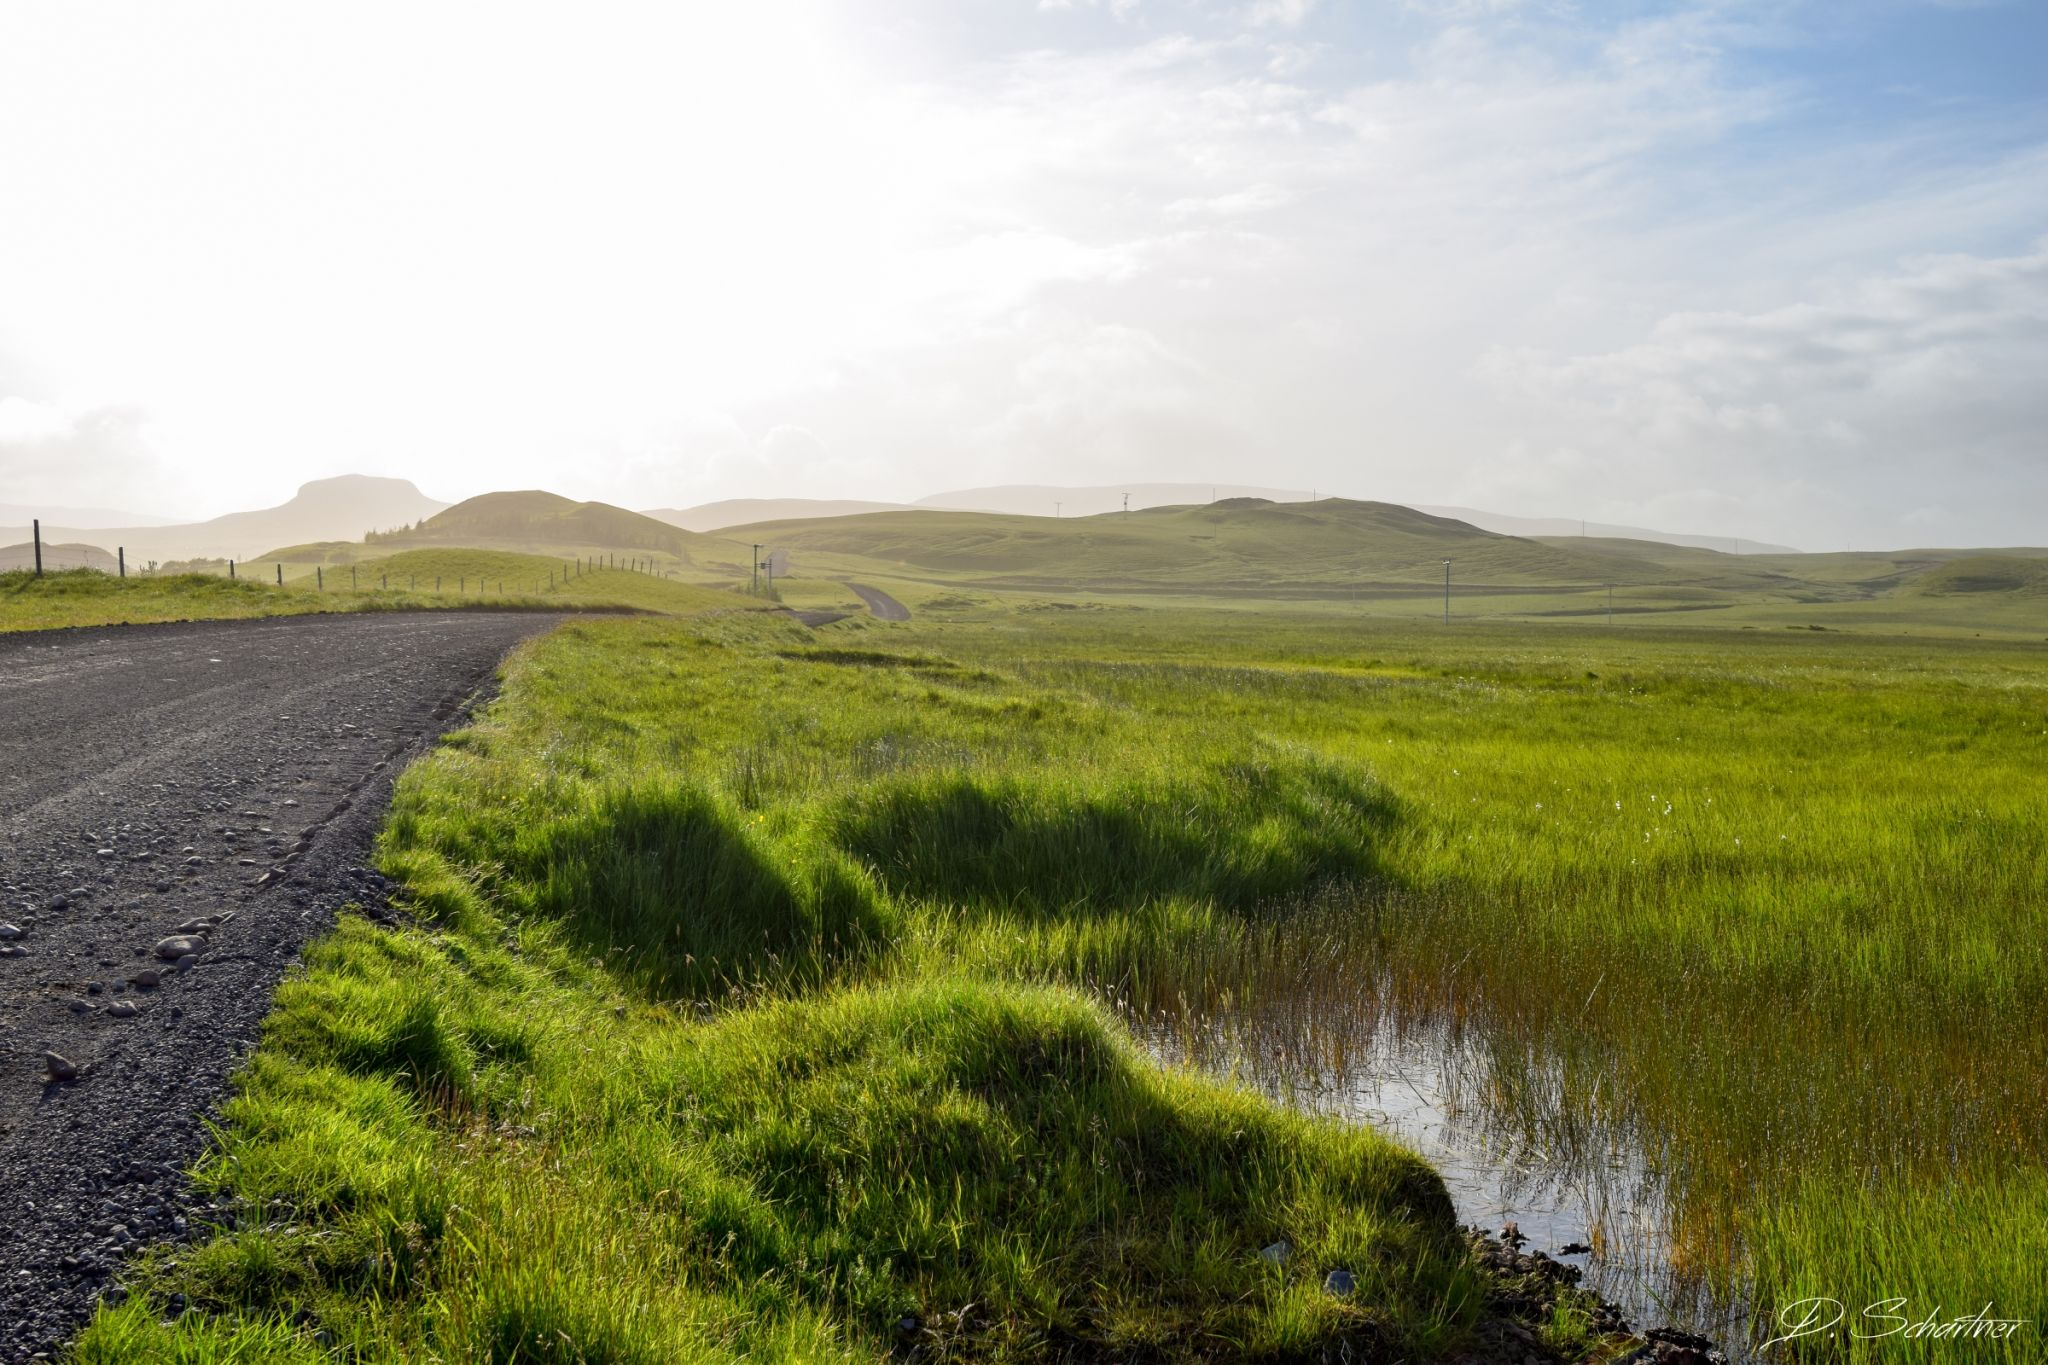 On the way to Fjaðrárgljúfur, Iceland